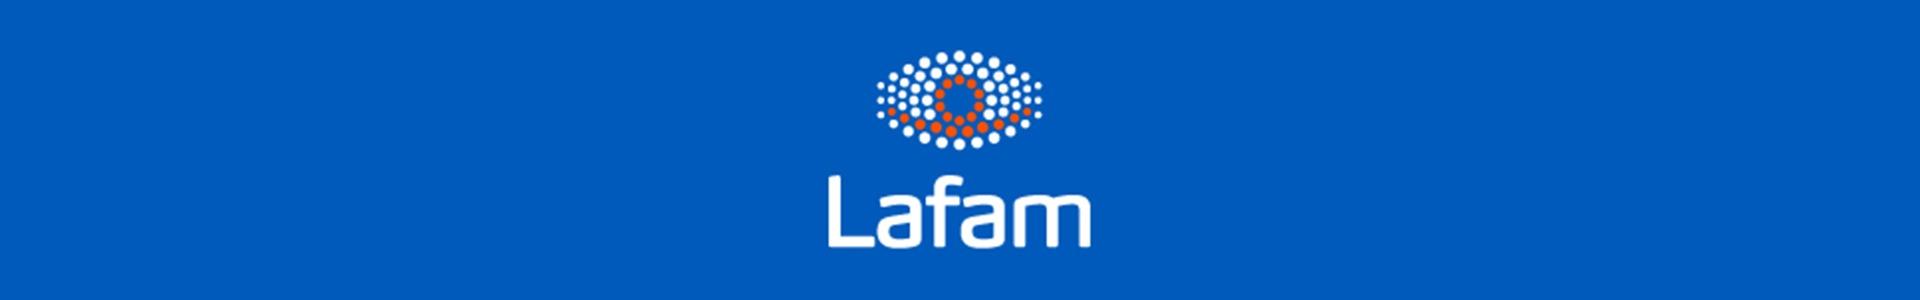 LAFAM-HEAD